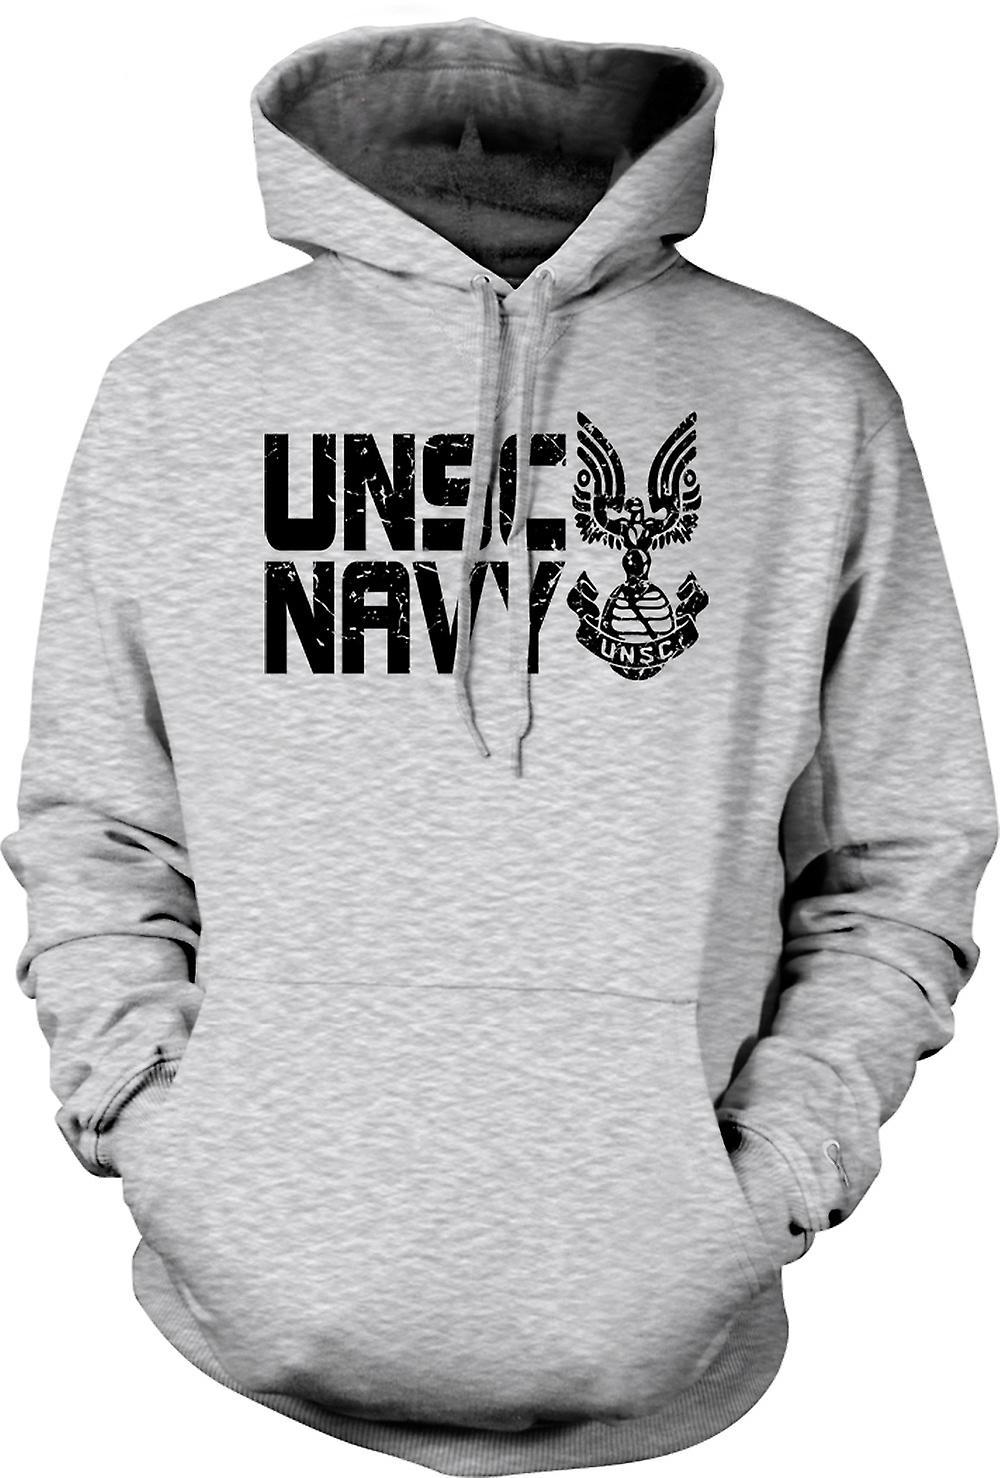 Mens Hoodie - UNSC marine Logo - Gamer